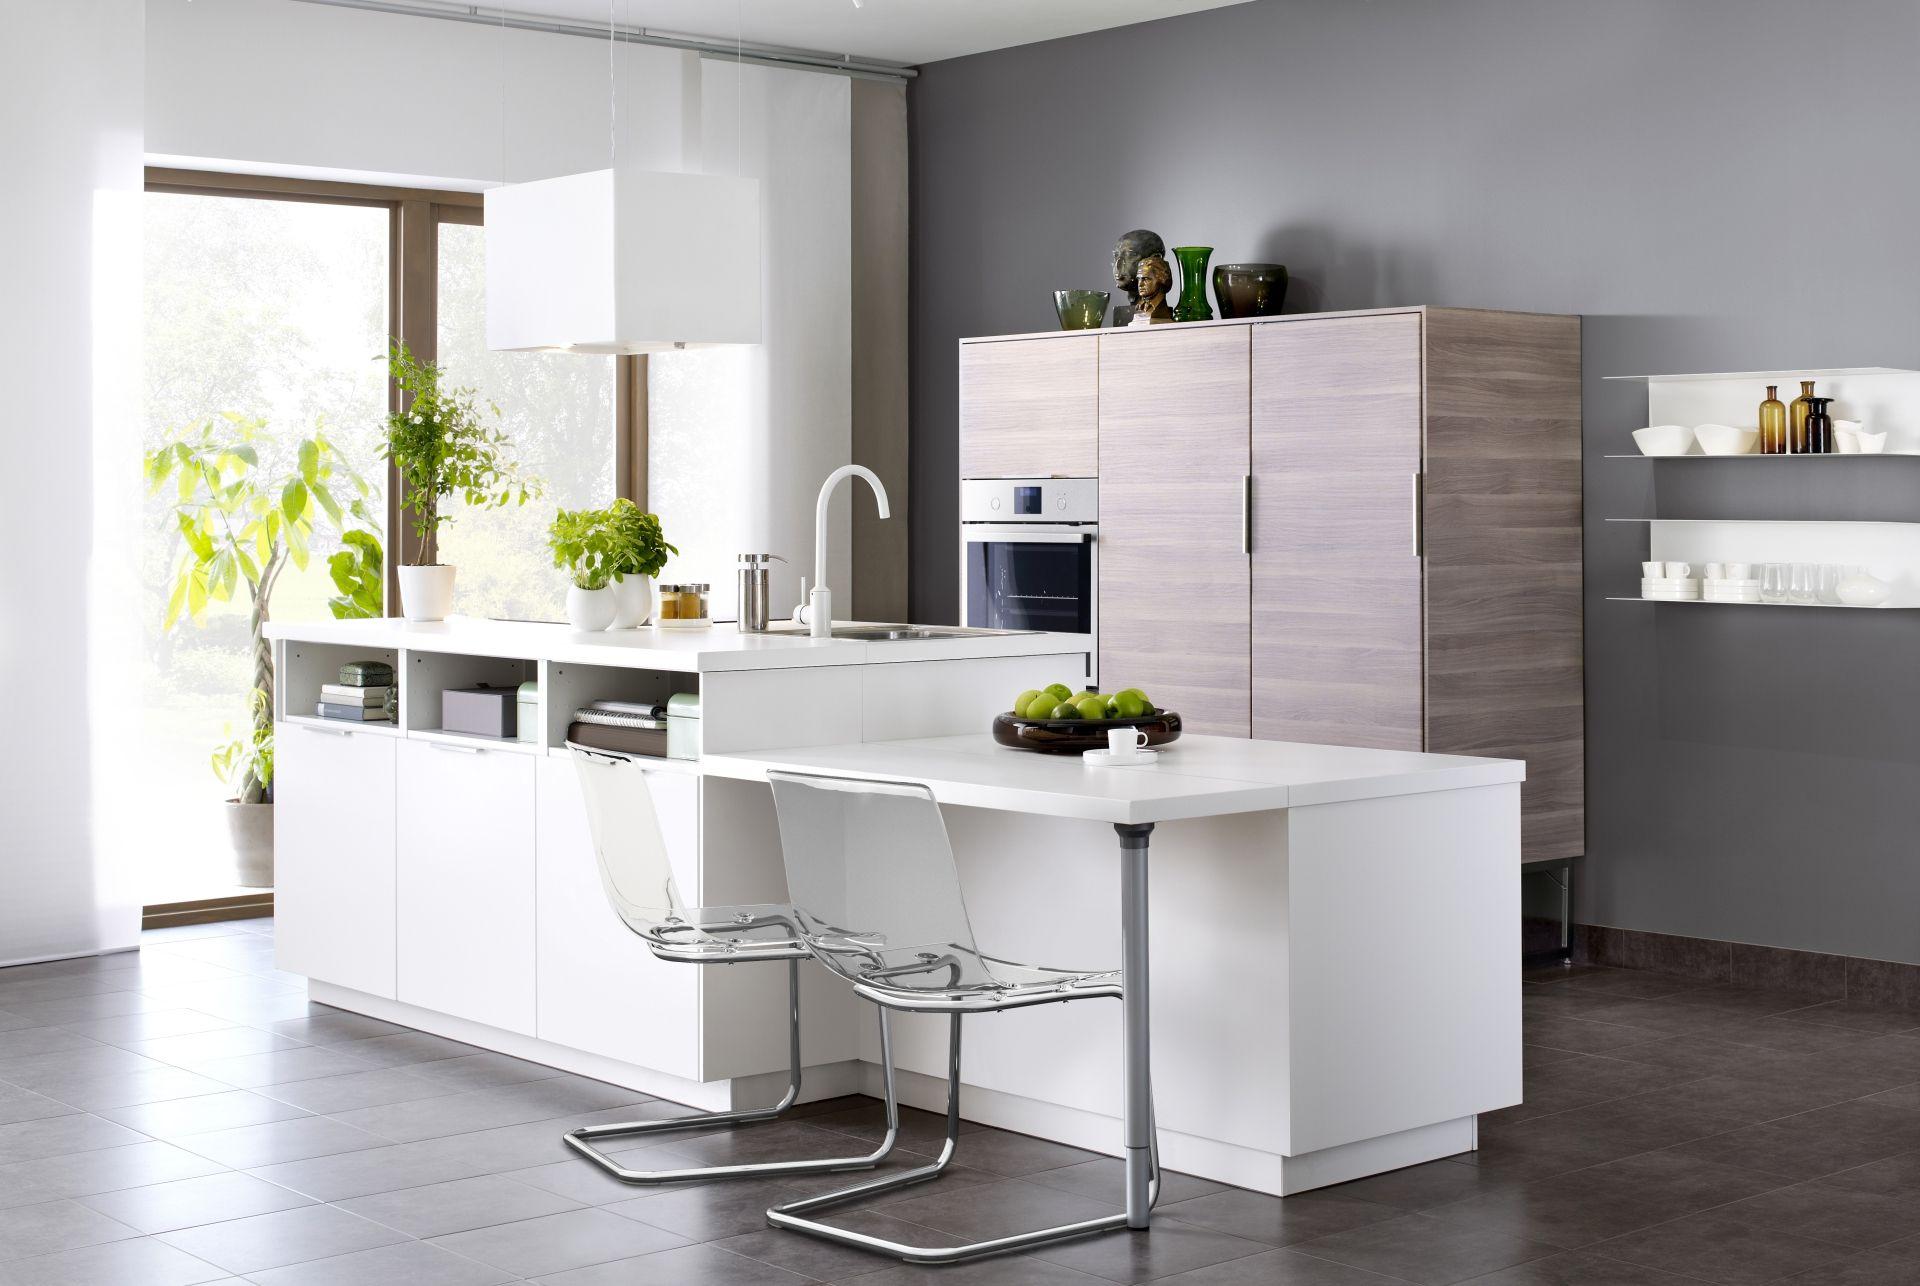 Keukenkast Ophangen Ikea : Metod keuken met een modern kookeiland #ikea #ikeanl #keukens